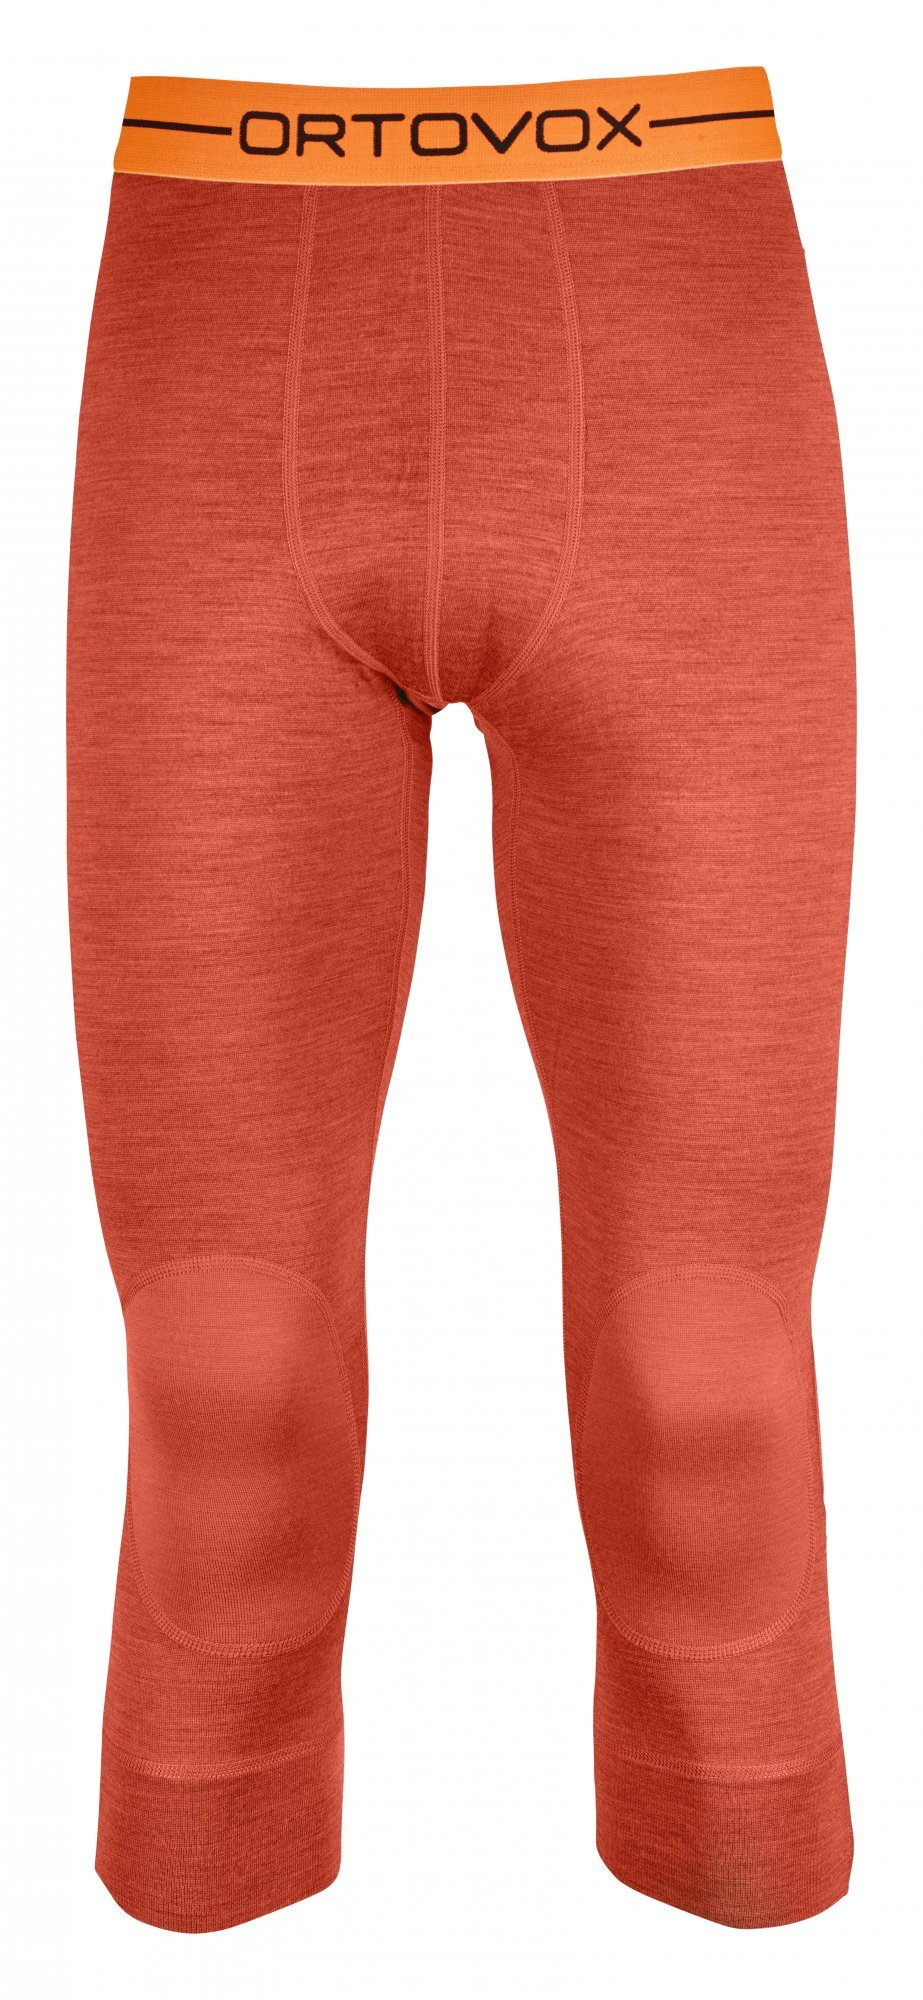 Ortovox Men's Rock'N'Wool 185 Short Pants Crazy Orange Blend M